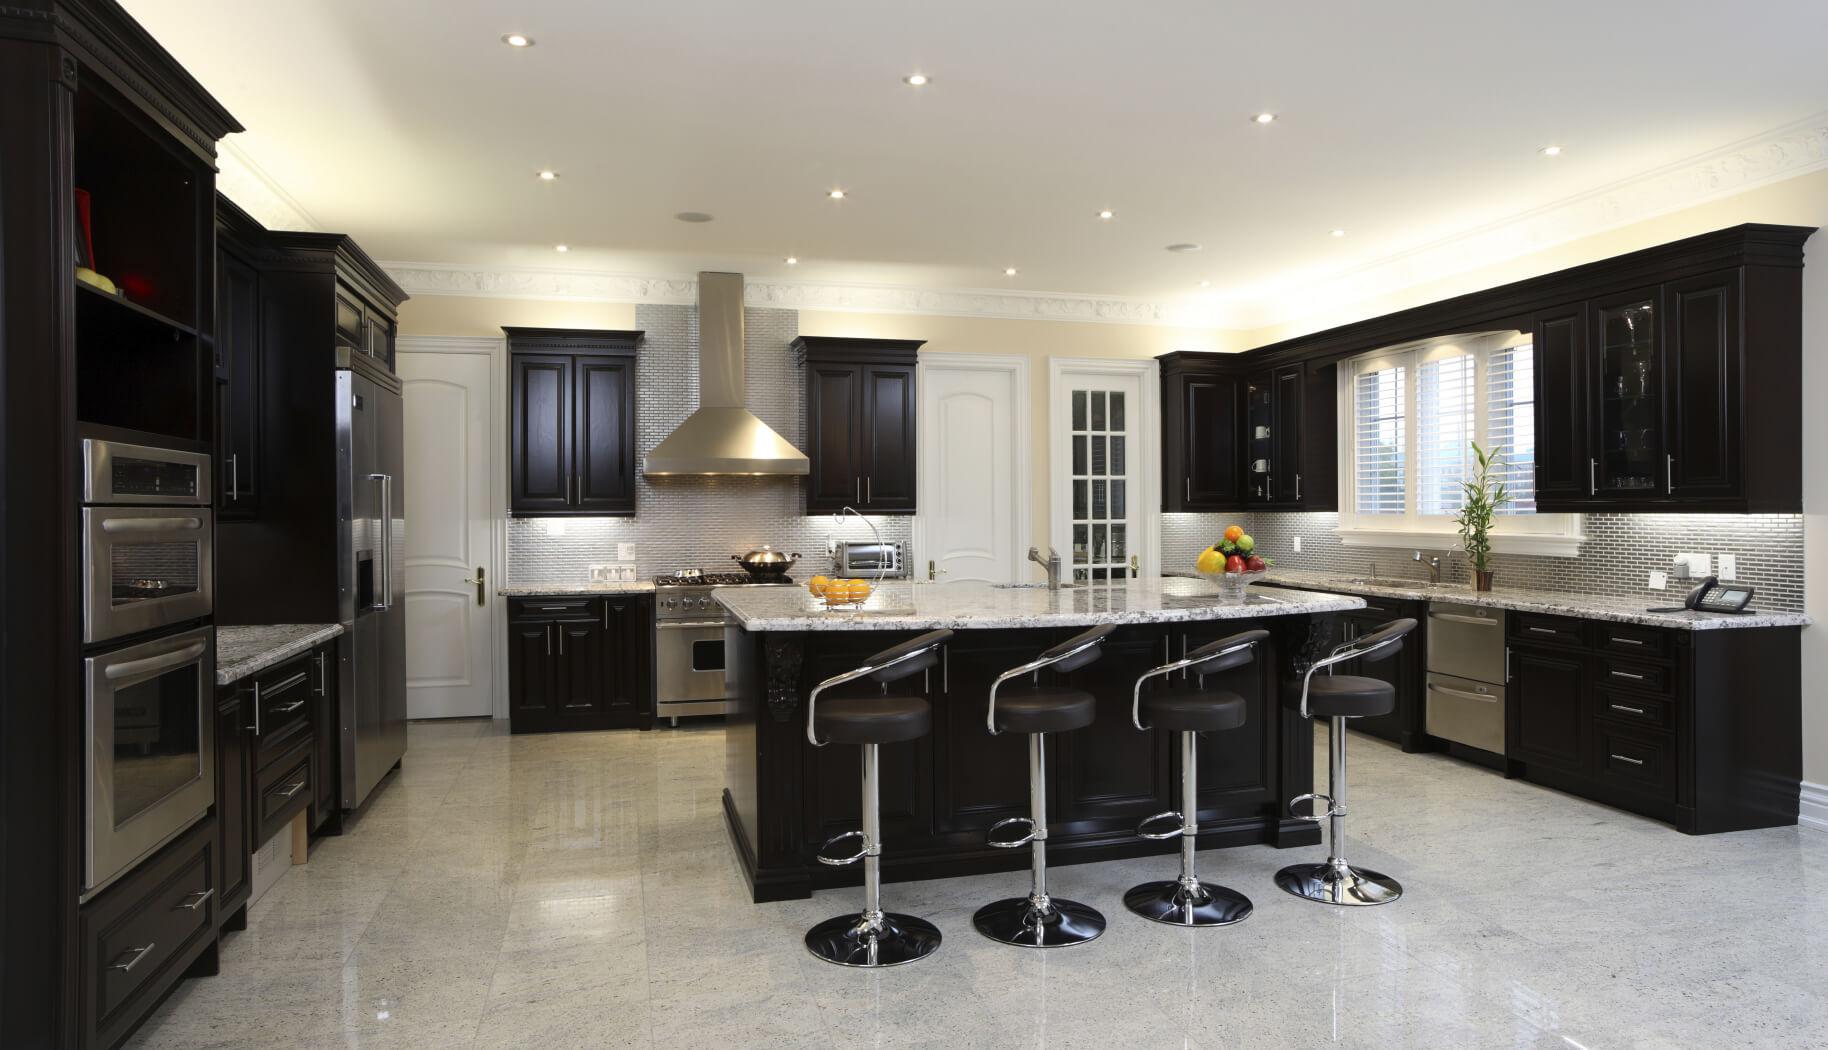 dark kitchen cabinets black kitchen countertops Spacious modern kitchen with dark cabinetry breakfast bar 4 modern diner style stools and